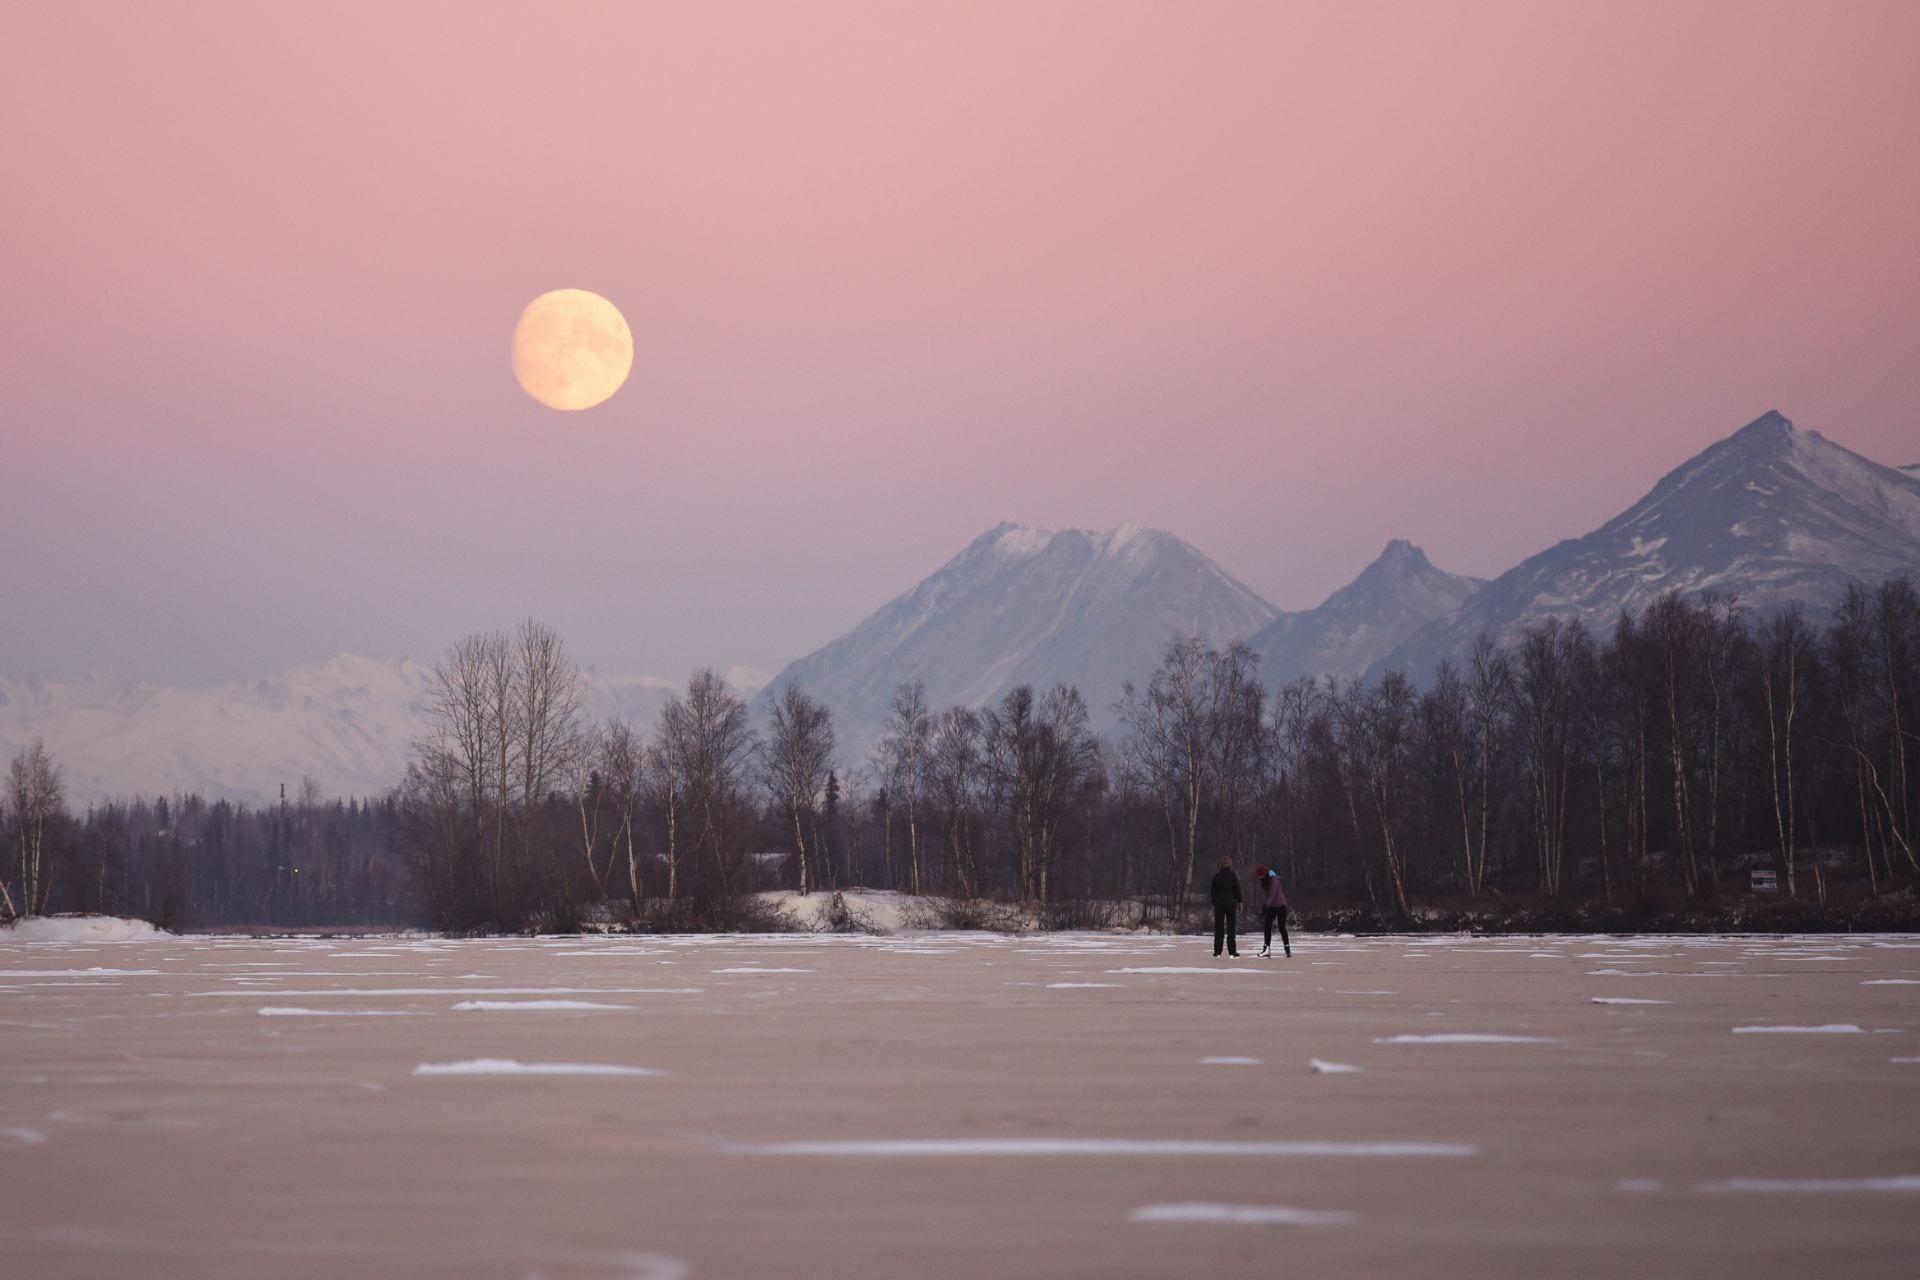 Skating on Wasilla Lake, in southcentral Alaska. (Image: Paxson Woelber/Unsplash)